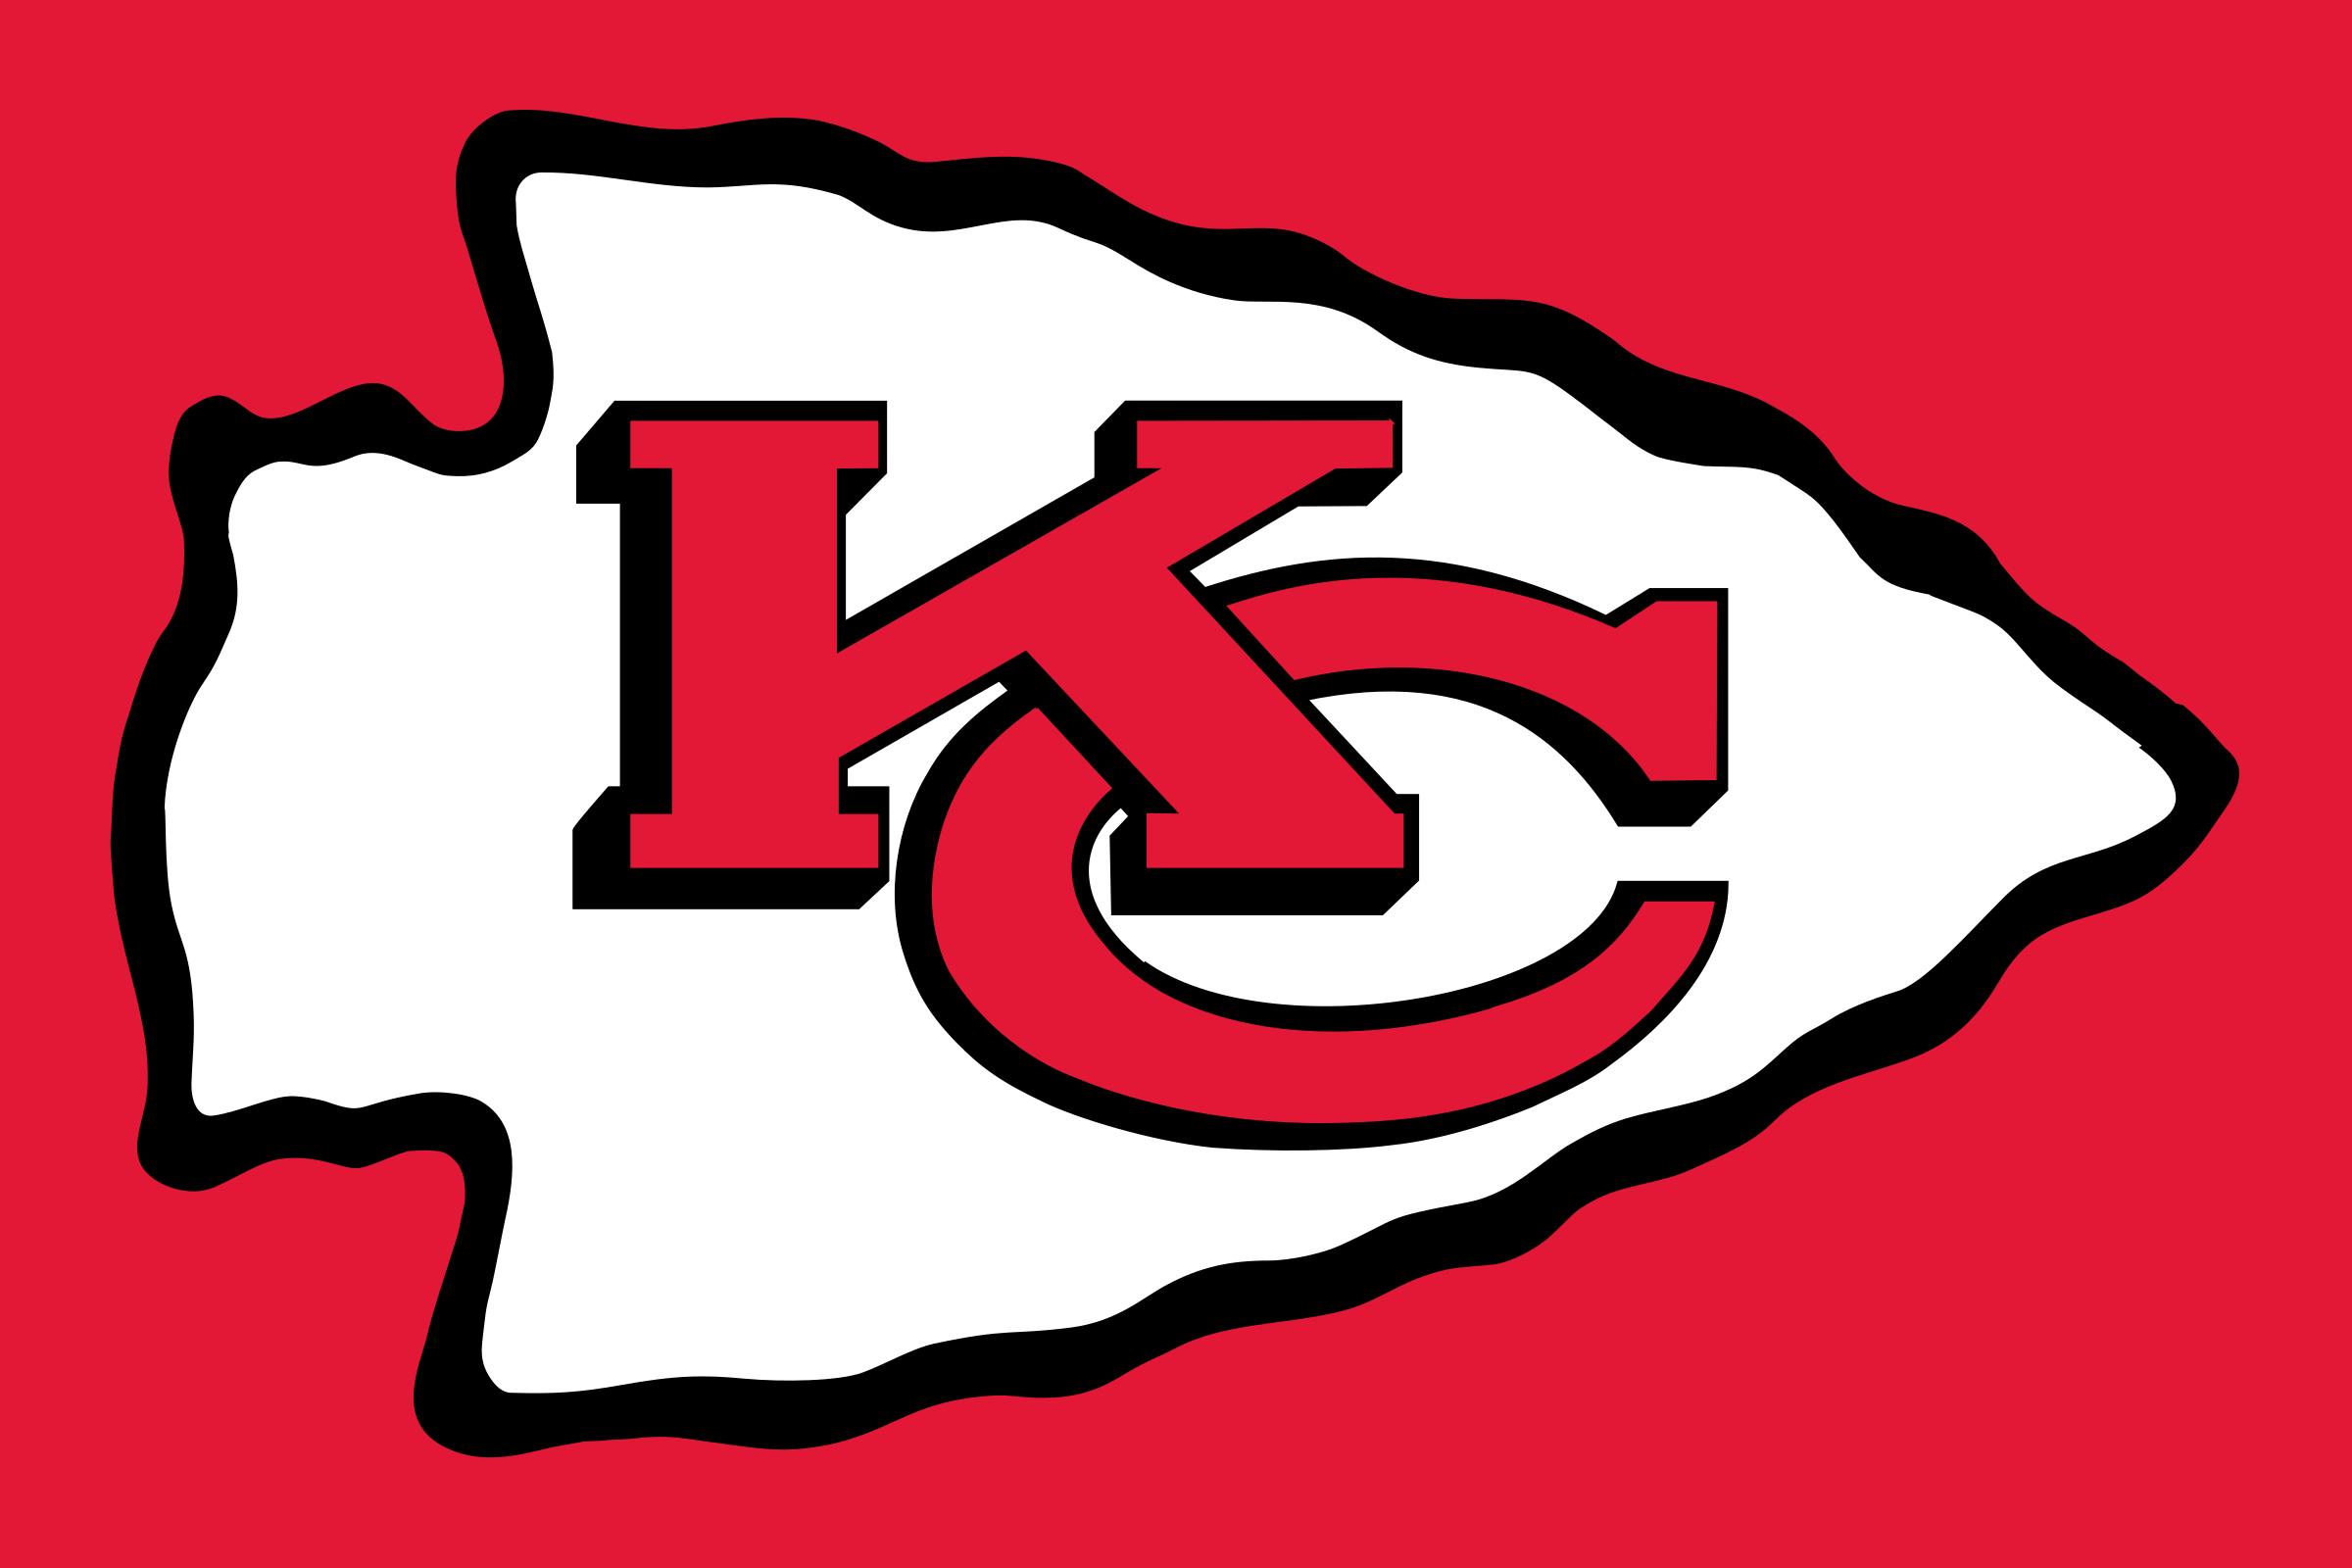 Kansas City Chiefs Logo PNG Transparent & SVG Vector.